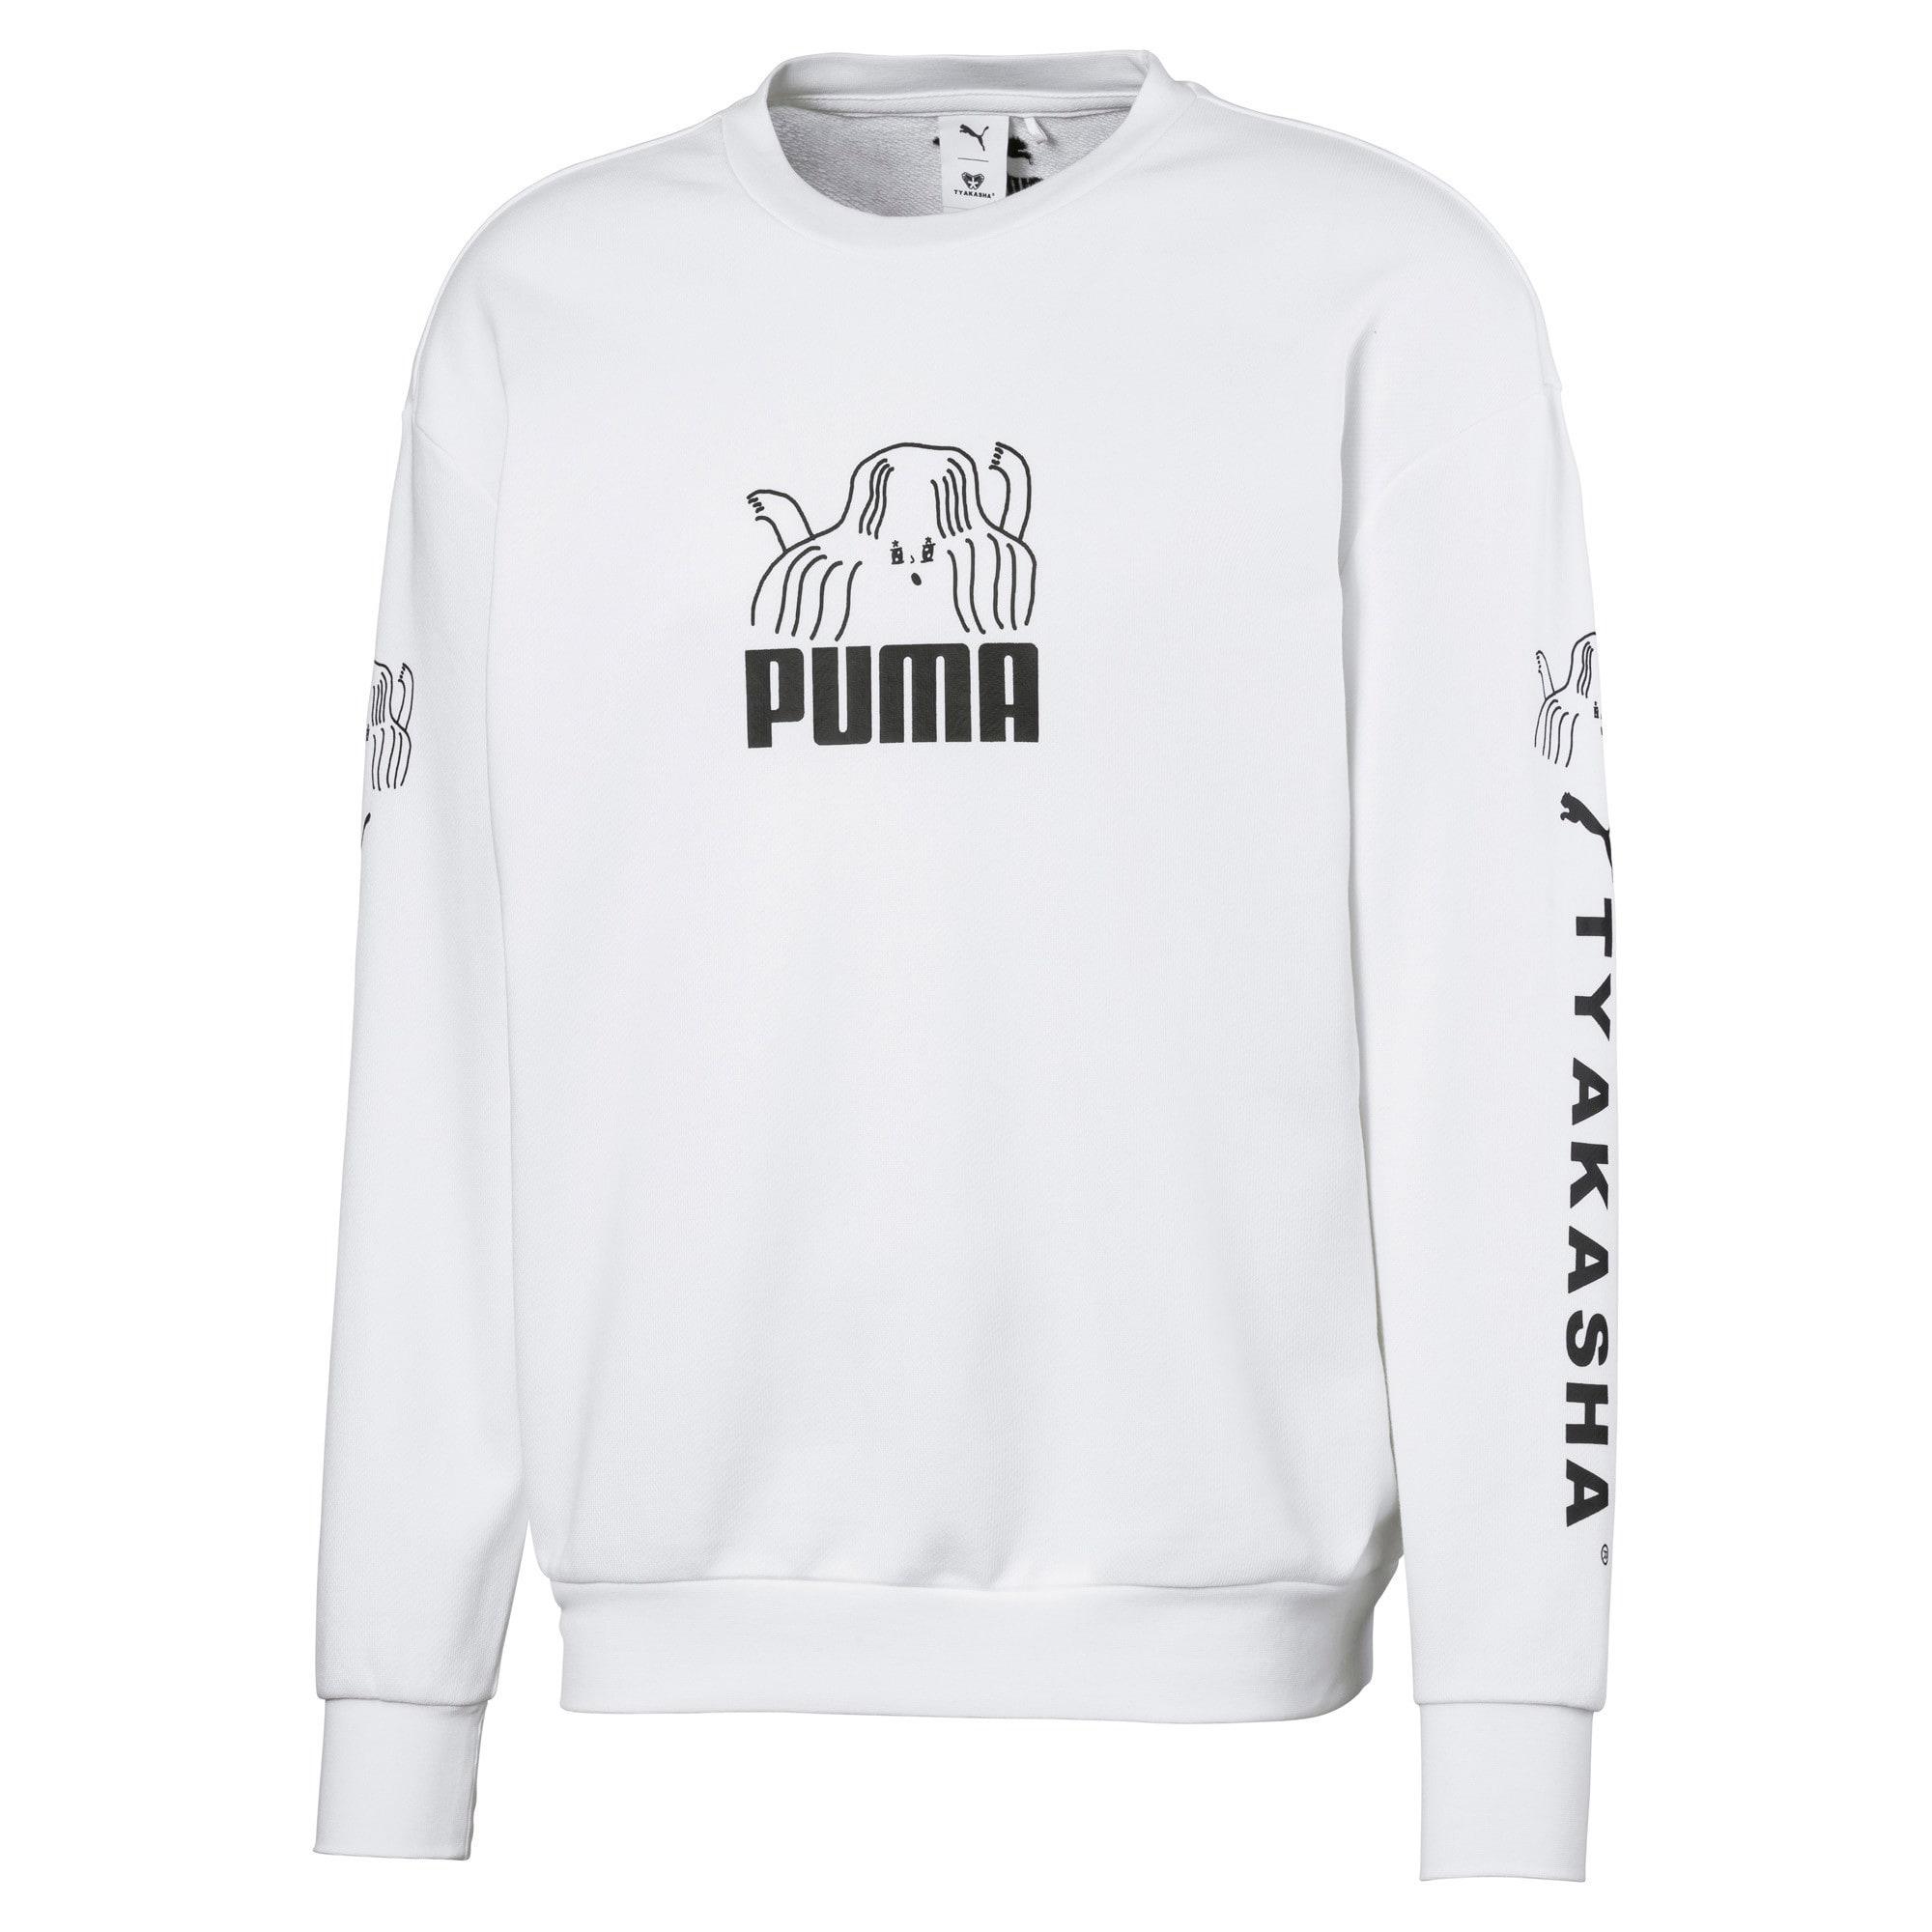 Thumbnail 1 of PUMA x TYAKASHA クルー, Puma White, medium-JPN